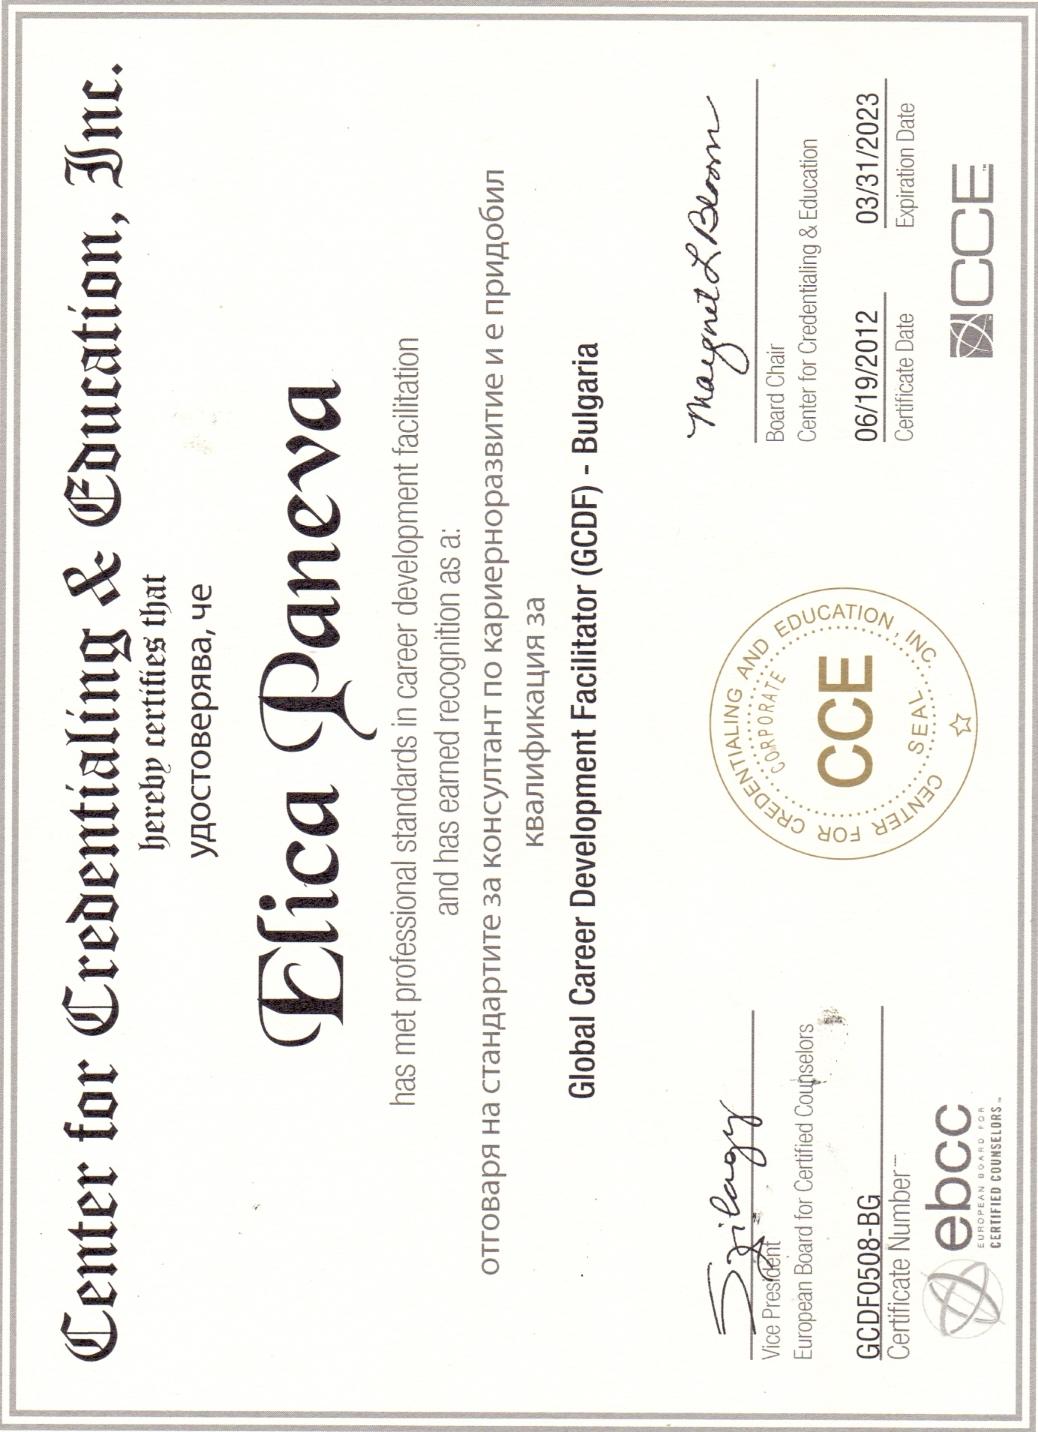 gdcf sertifikat nov0001_resized_20200430